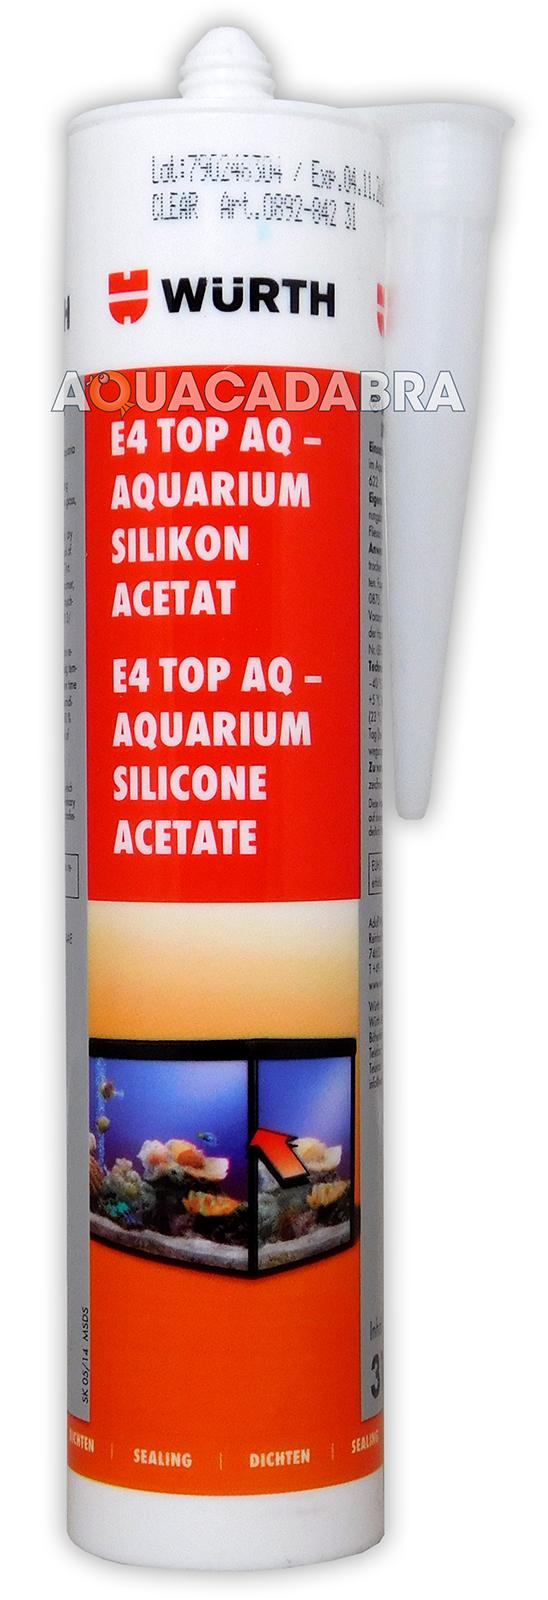 wurth silicone acetate fish tank aquarium clear glass tile pond